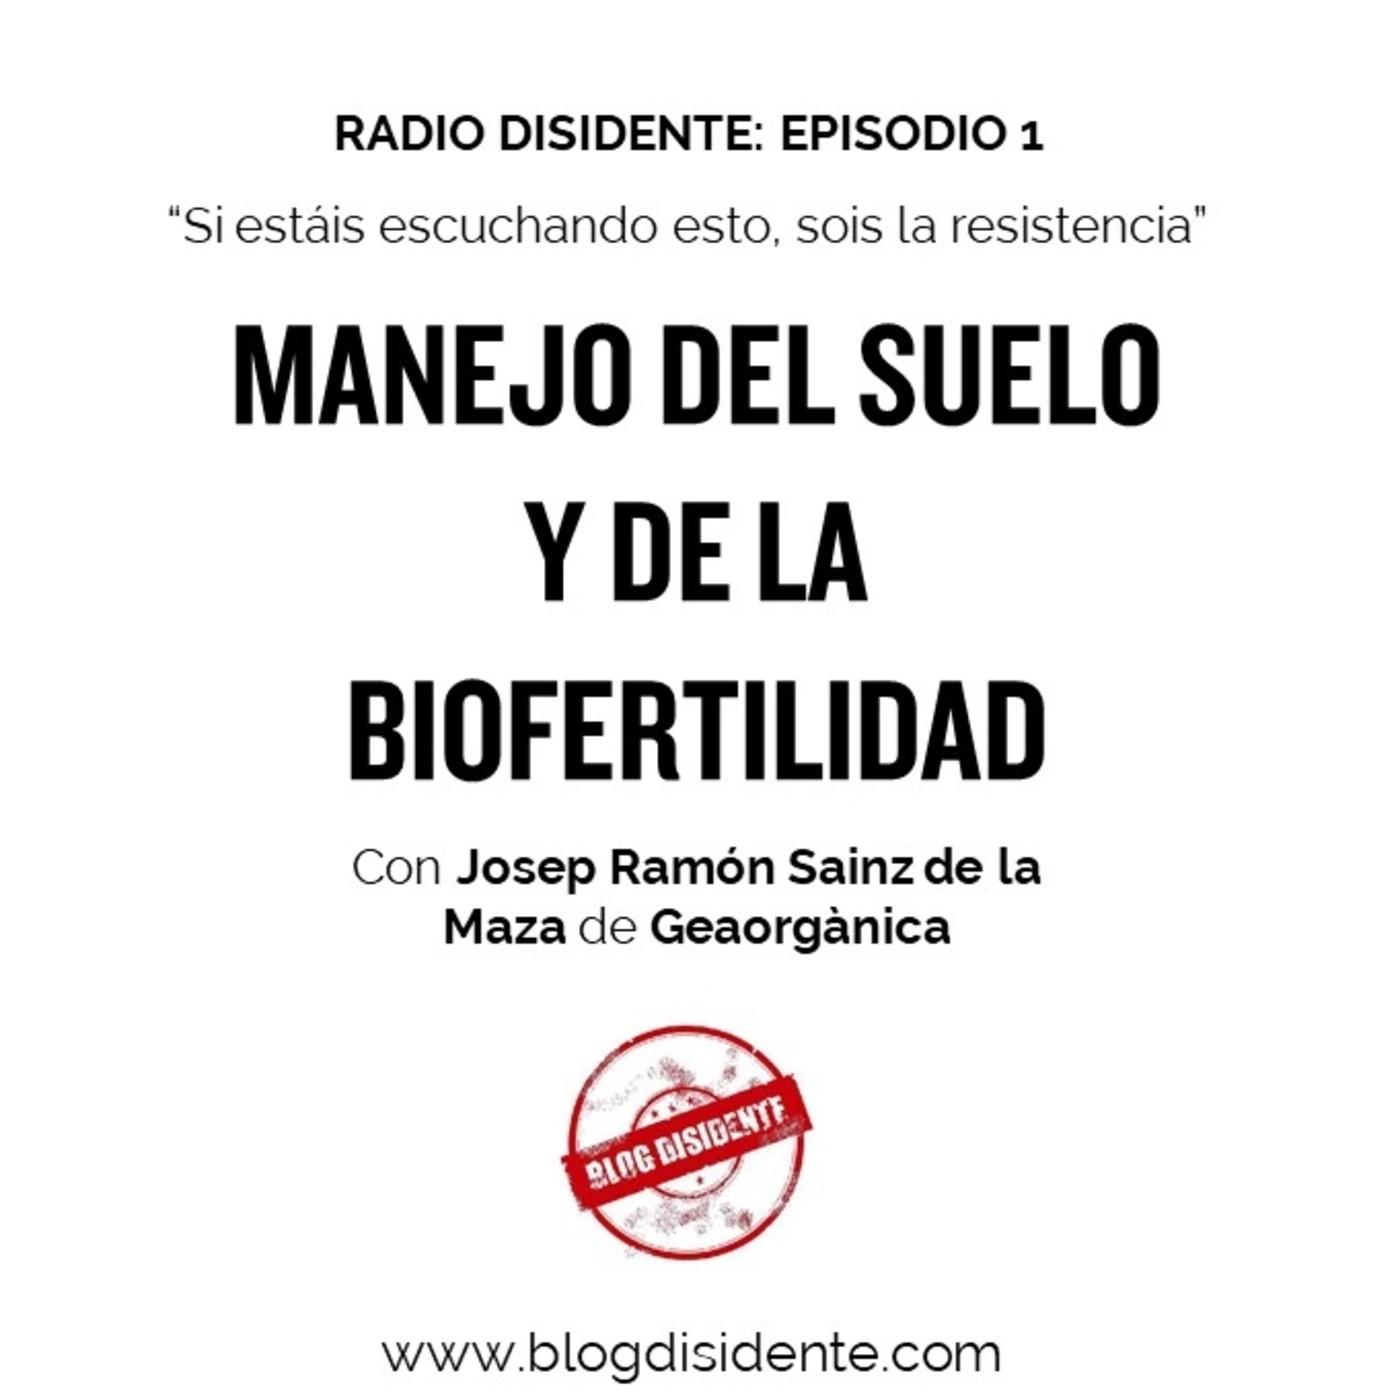 Radio Disidente